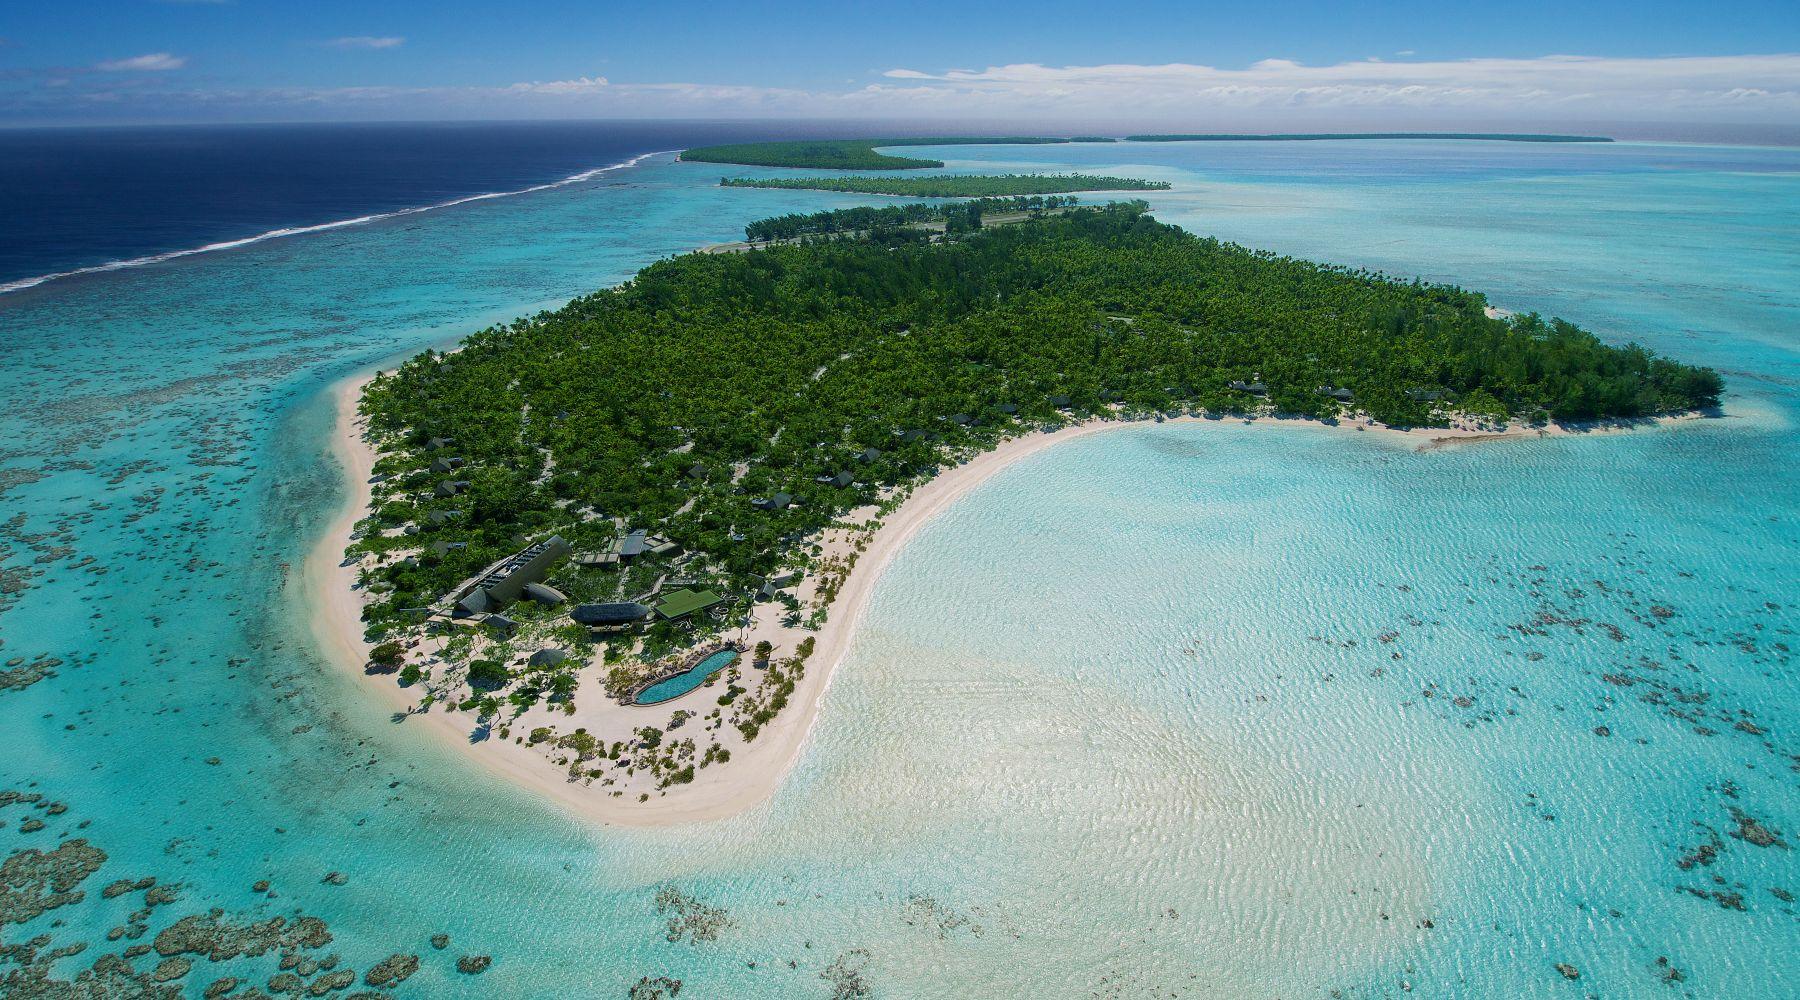 The Brando, Tetiaroa, Tahiti